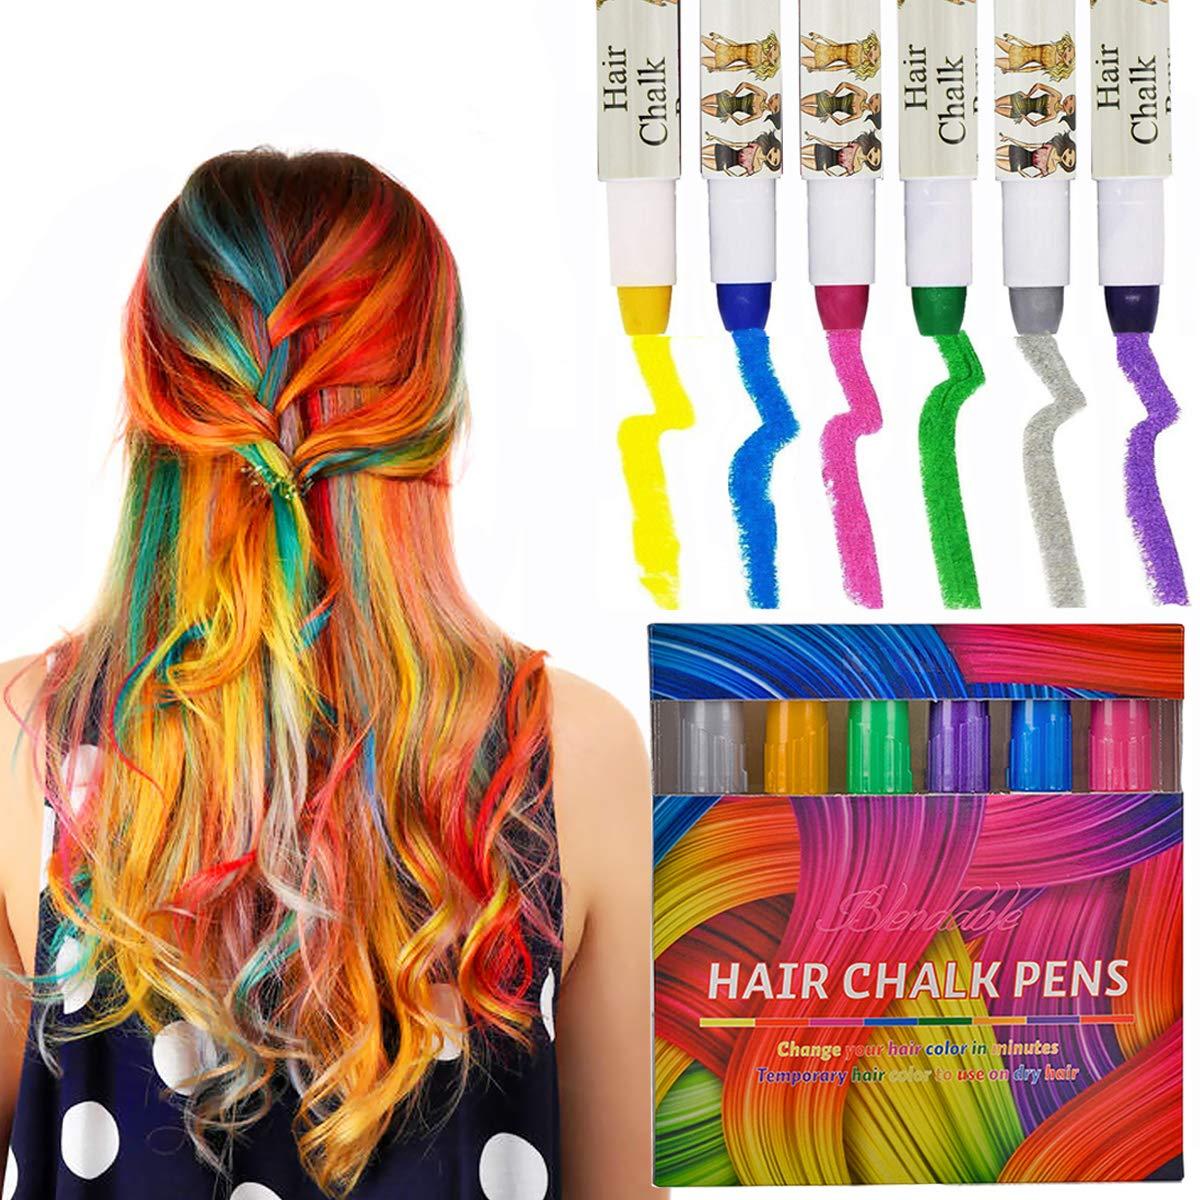 Hair Chalk Set, Kyerivs 6 Color Metallic Glitter Temporary Hair ...